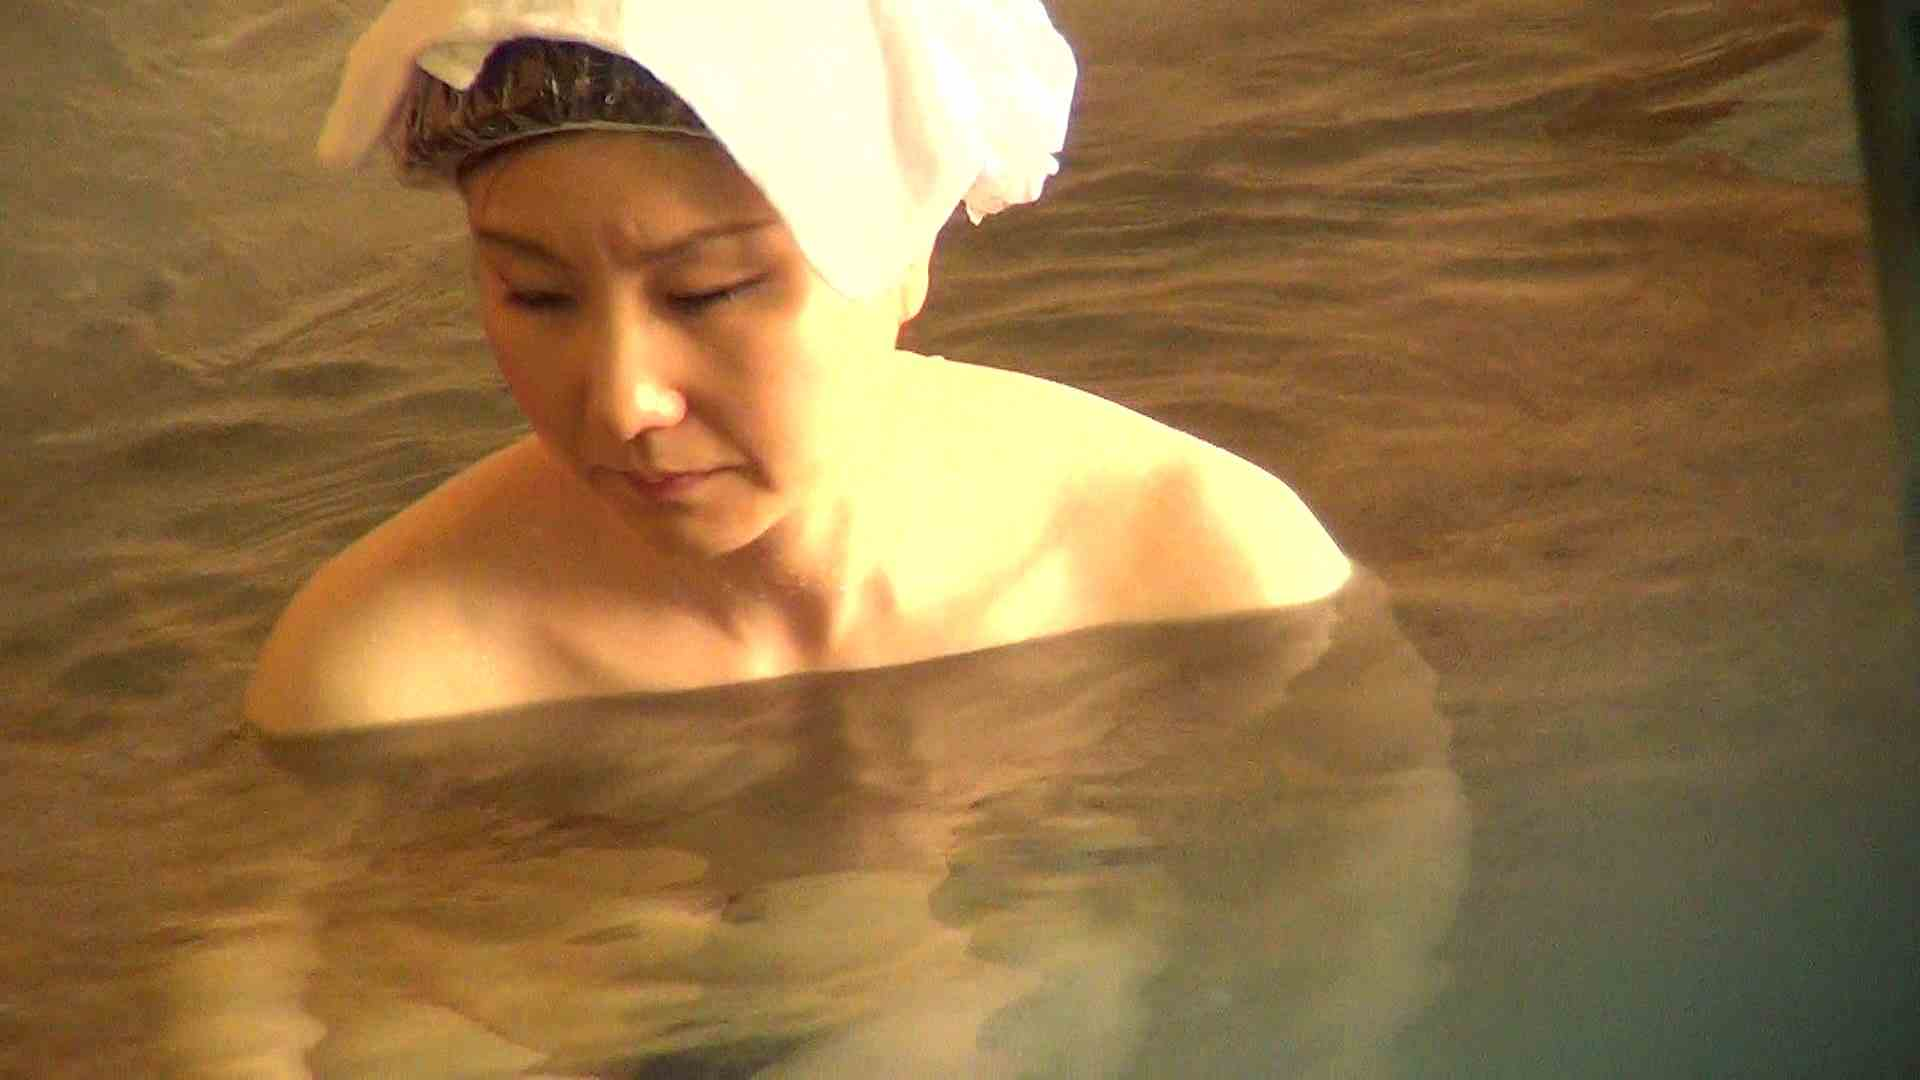 Aquaな露天風呂Vol.278 盗撮シリーズ | 露天風呂編  100PIX 63